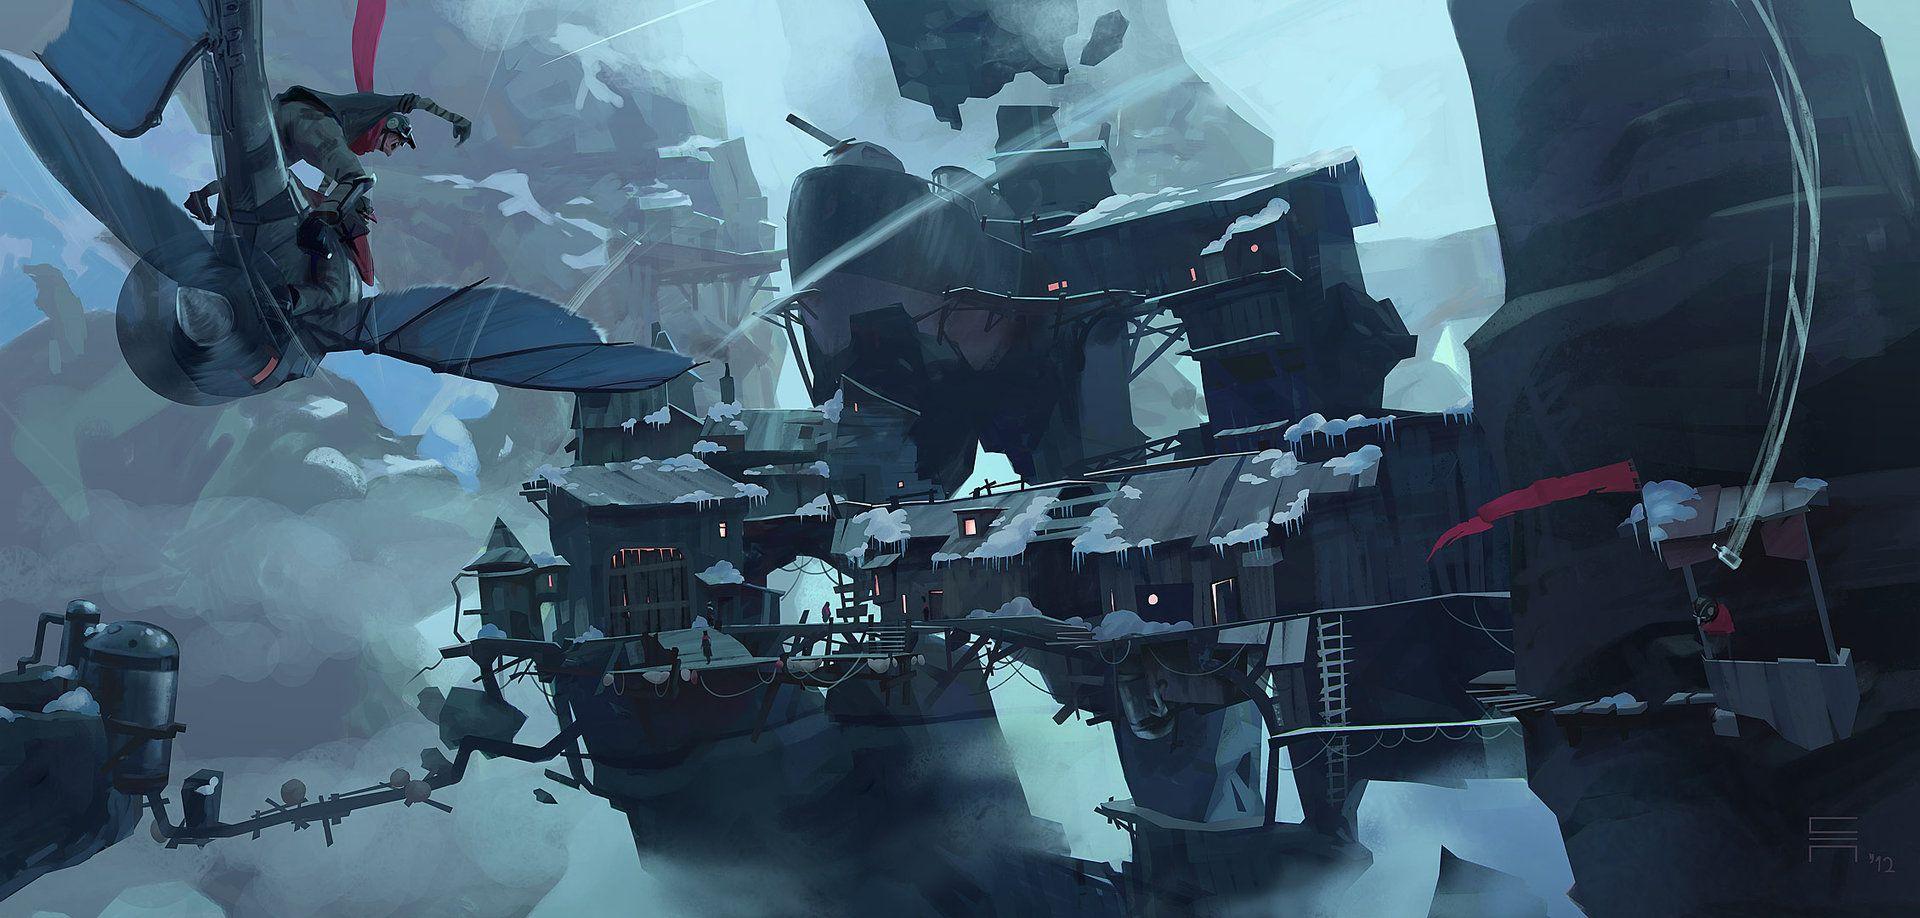 https://www.artstation.com/artwork/airborn-ice-setting-2